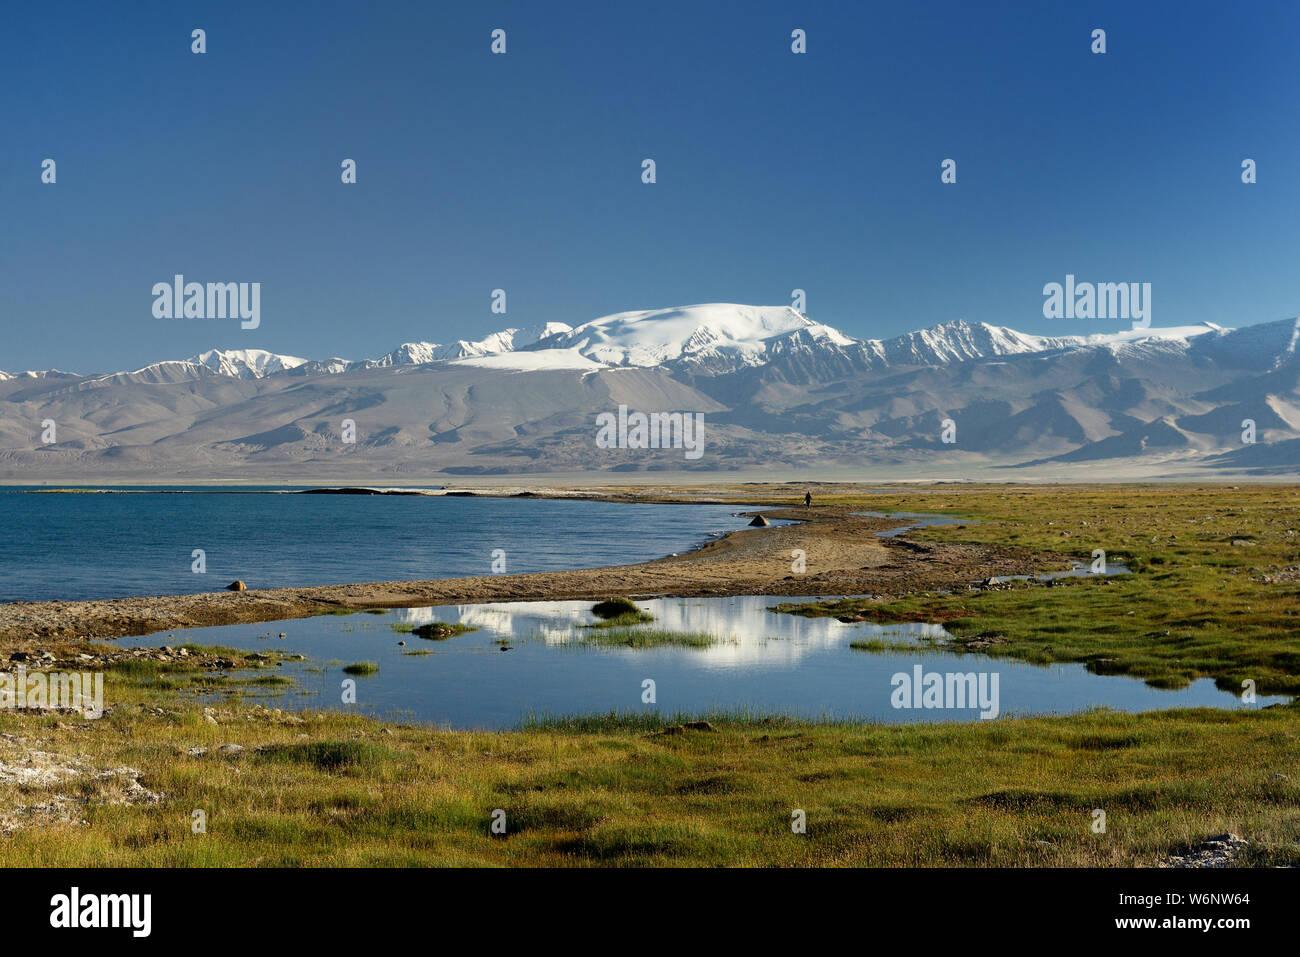 The beautiful Karakul lake by the Pamir highway. View on the lake and Peak Lenin near Karakul village in the Pamirs, Tajikistan, Central Asia. Stock Photo